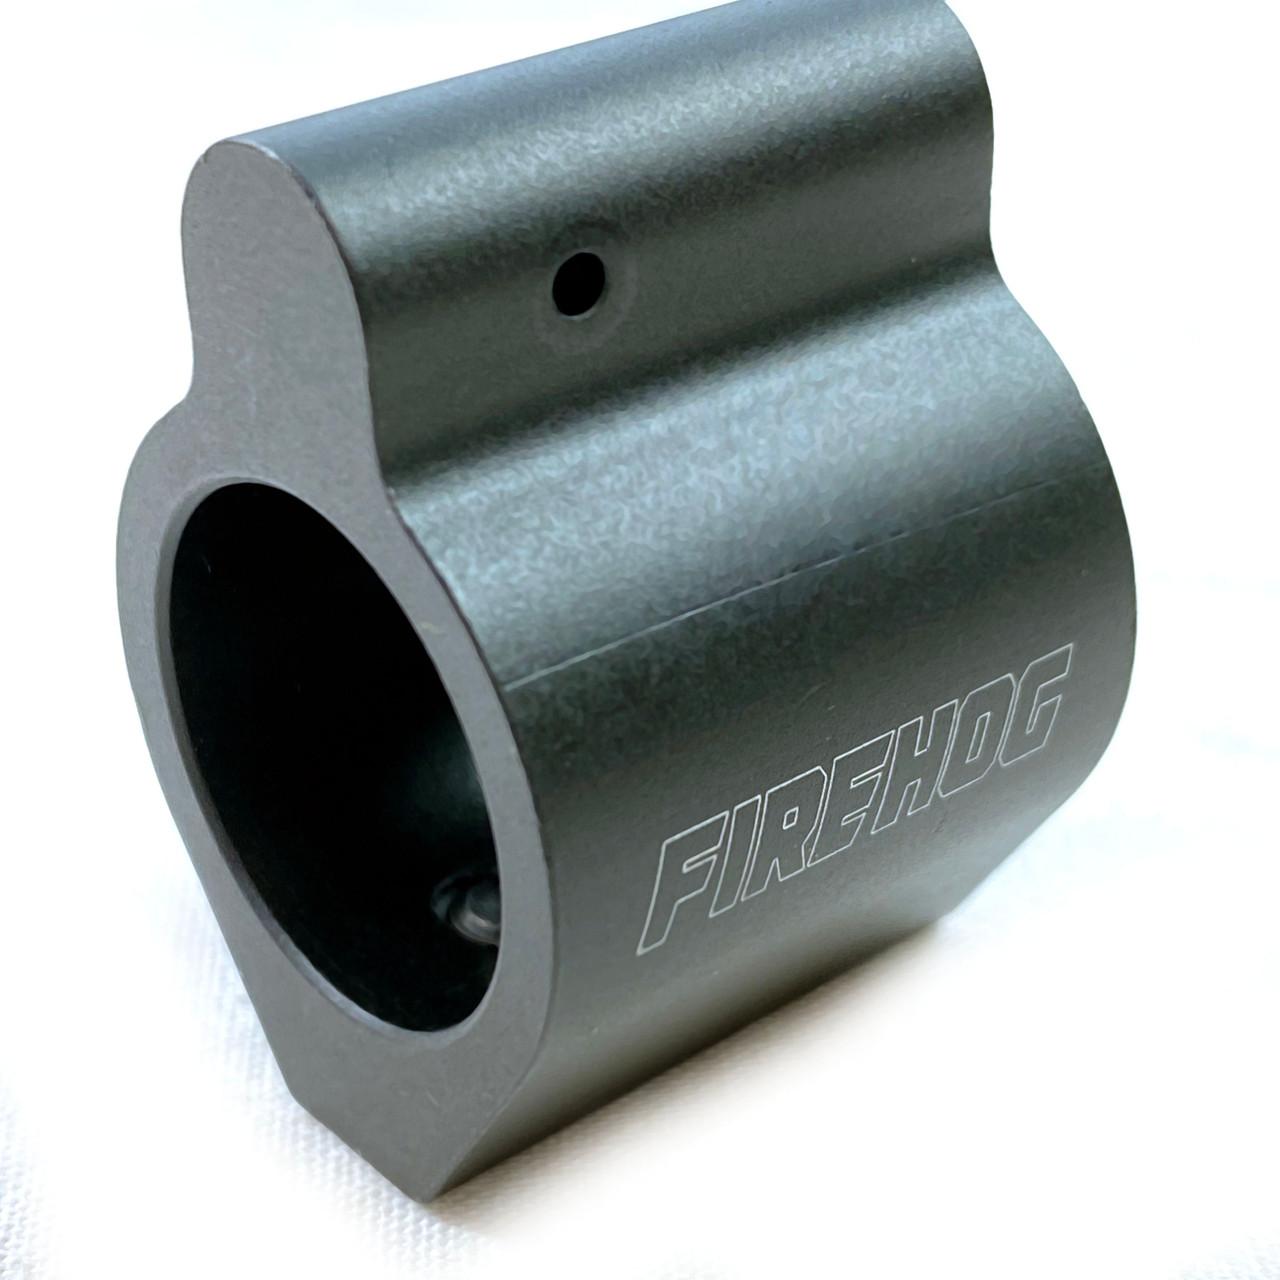 Fire Hog MOD-GBA750 AR-15 Micro Gas Block .750, Aluminum (UP-0520129)